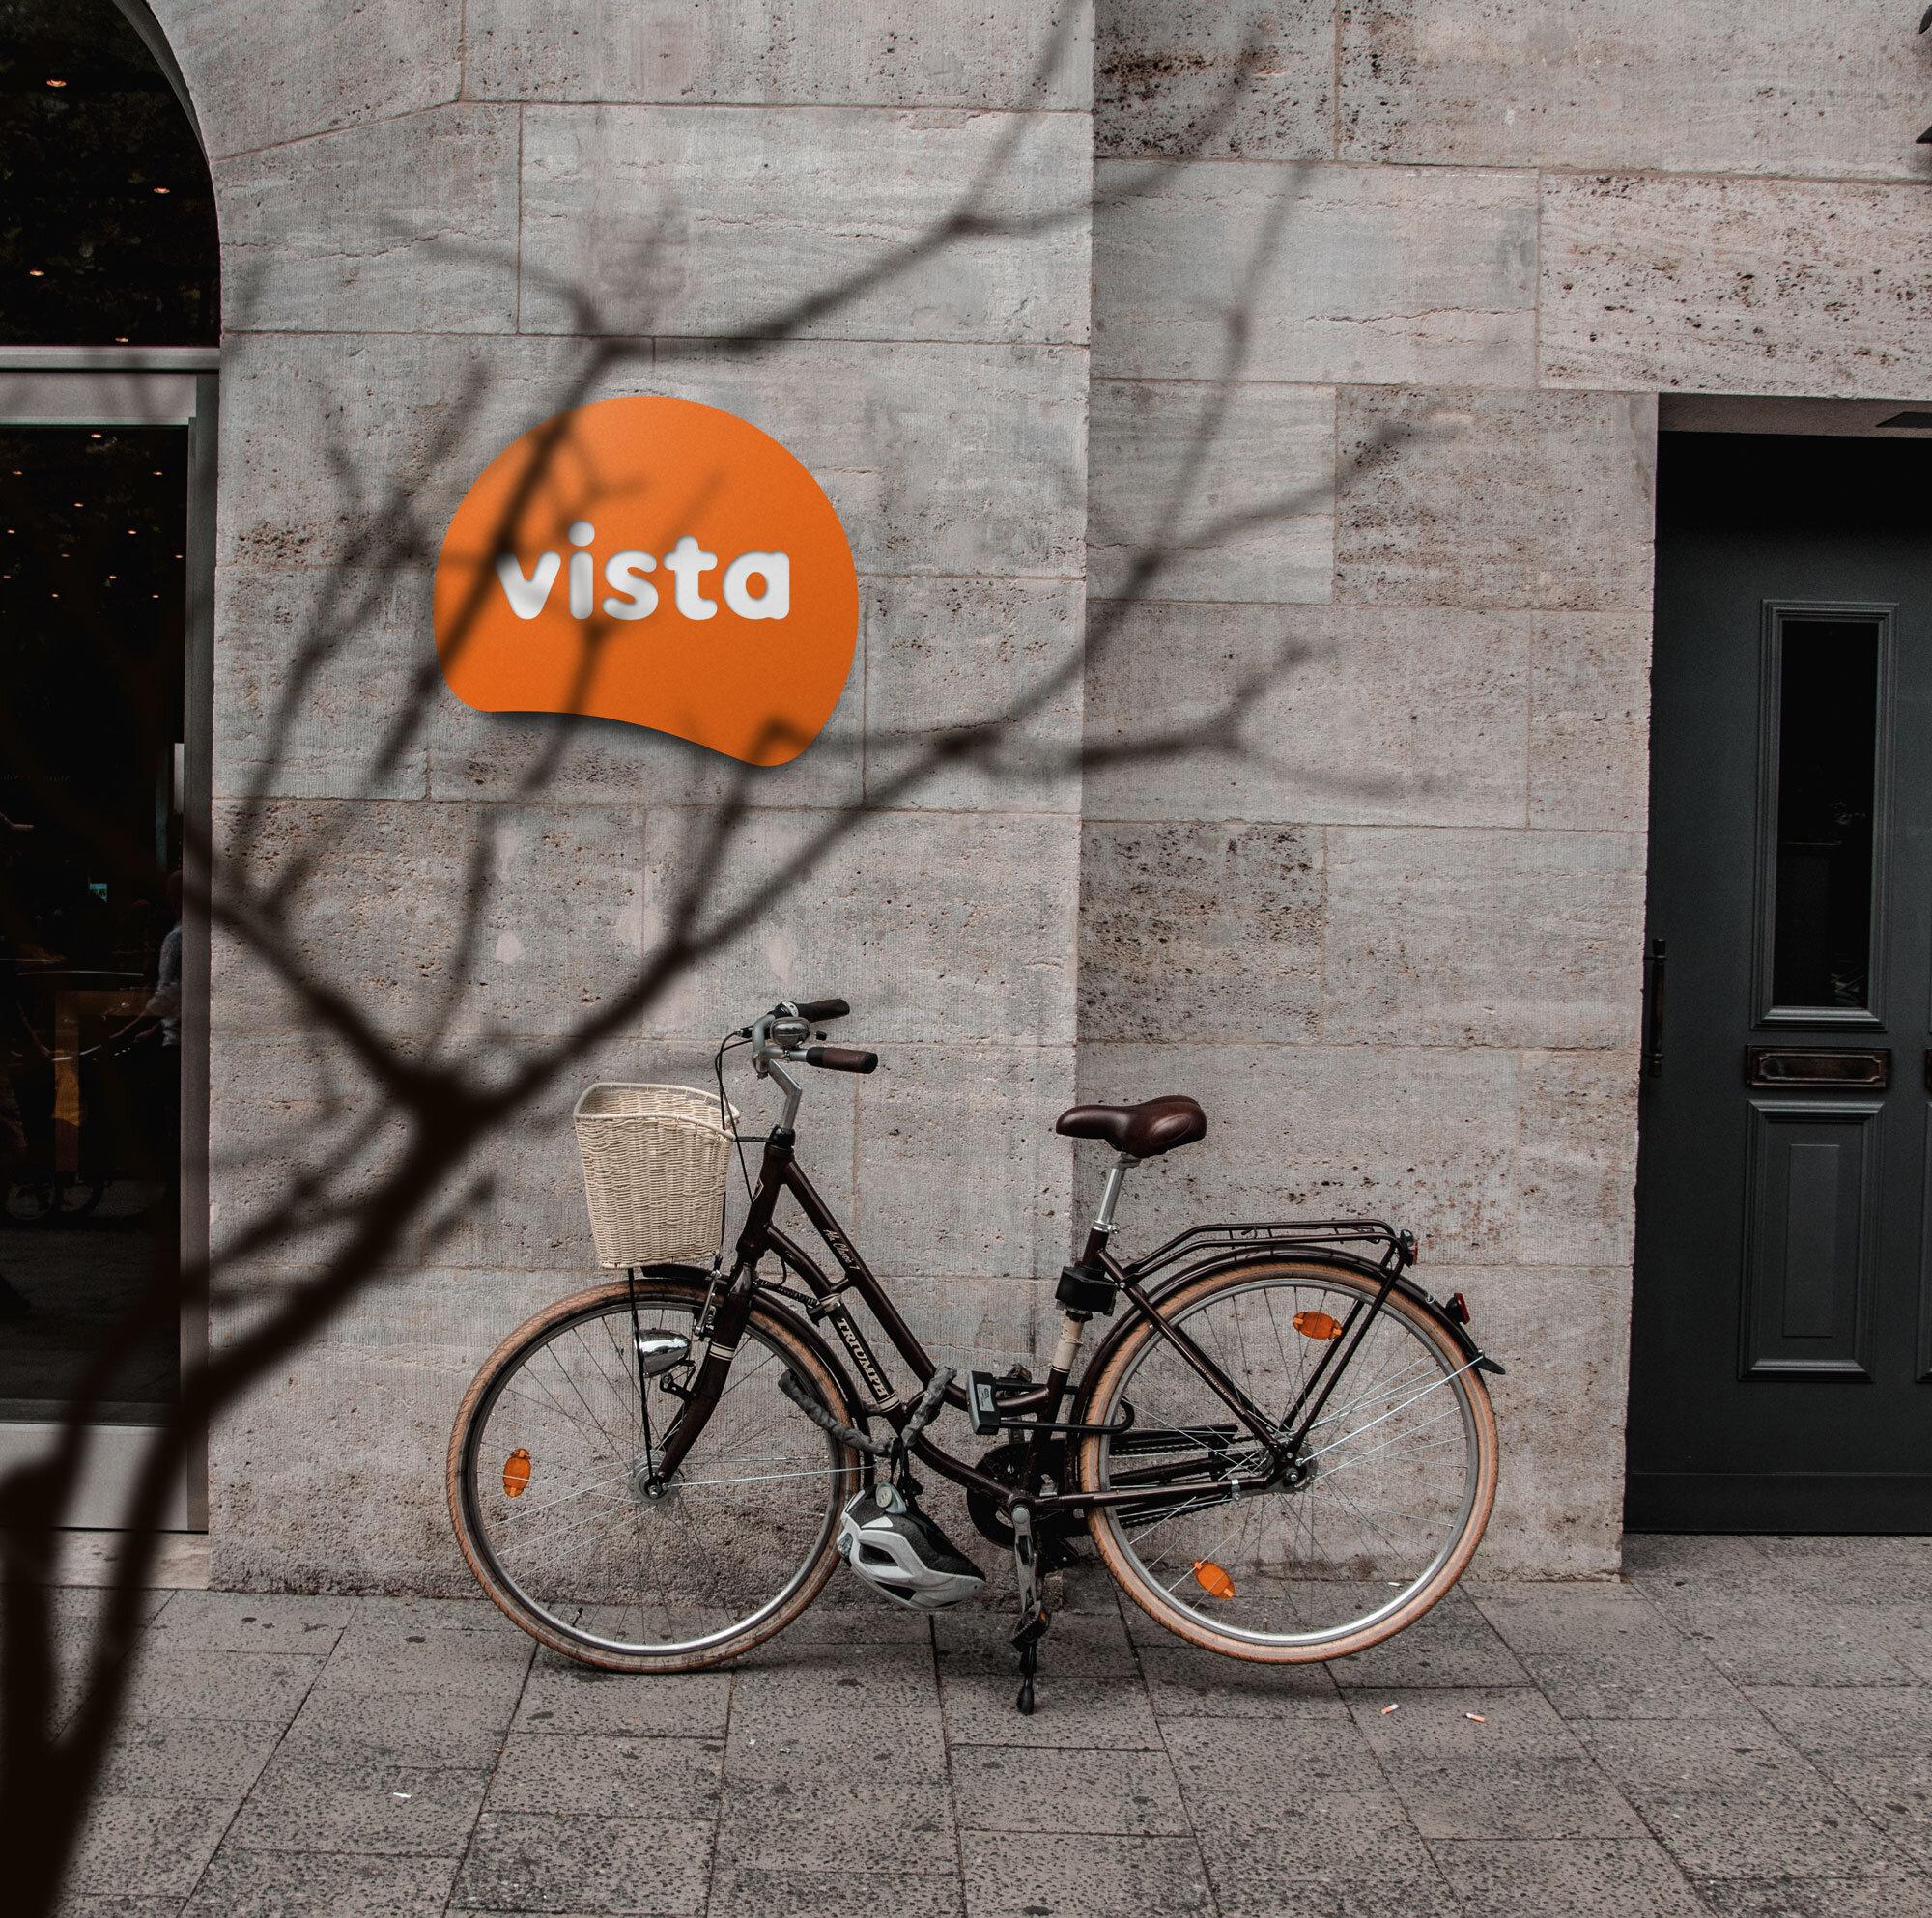 Vista Sign